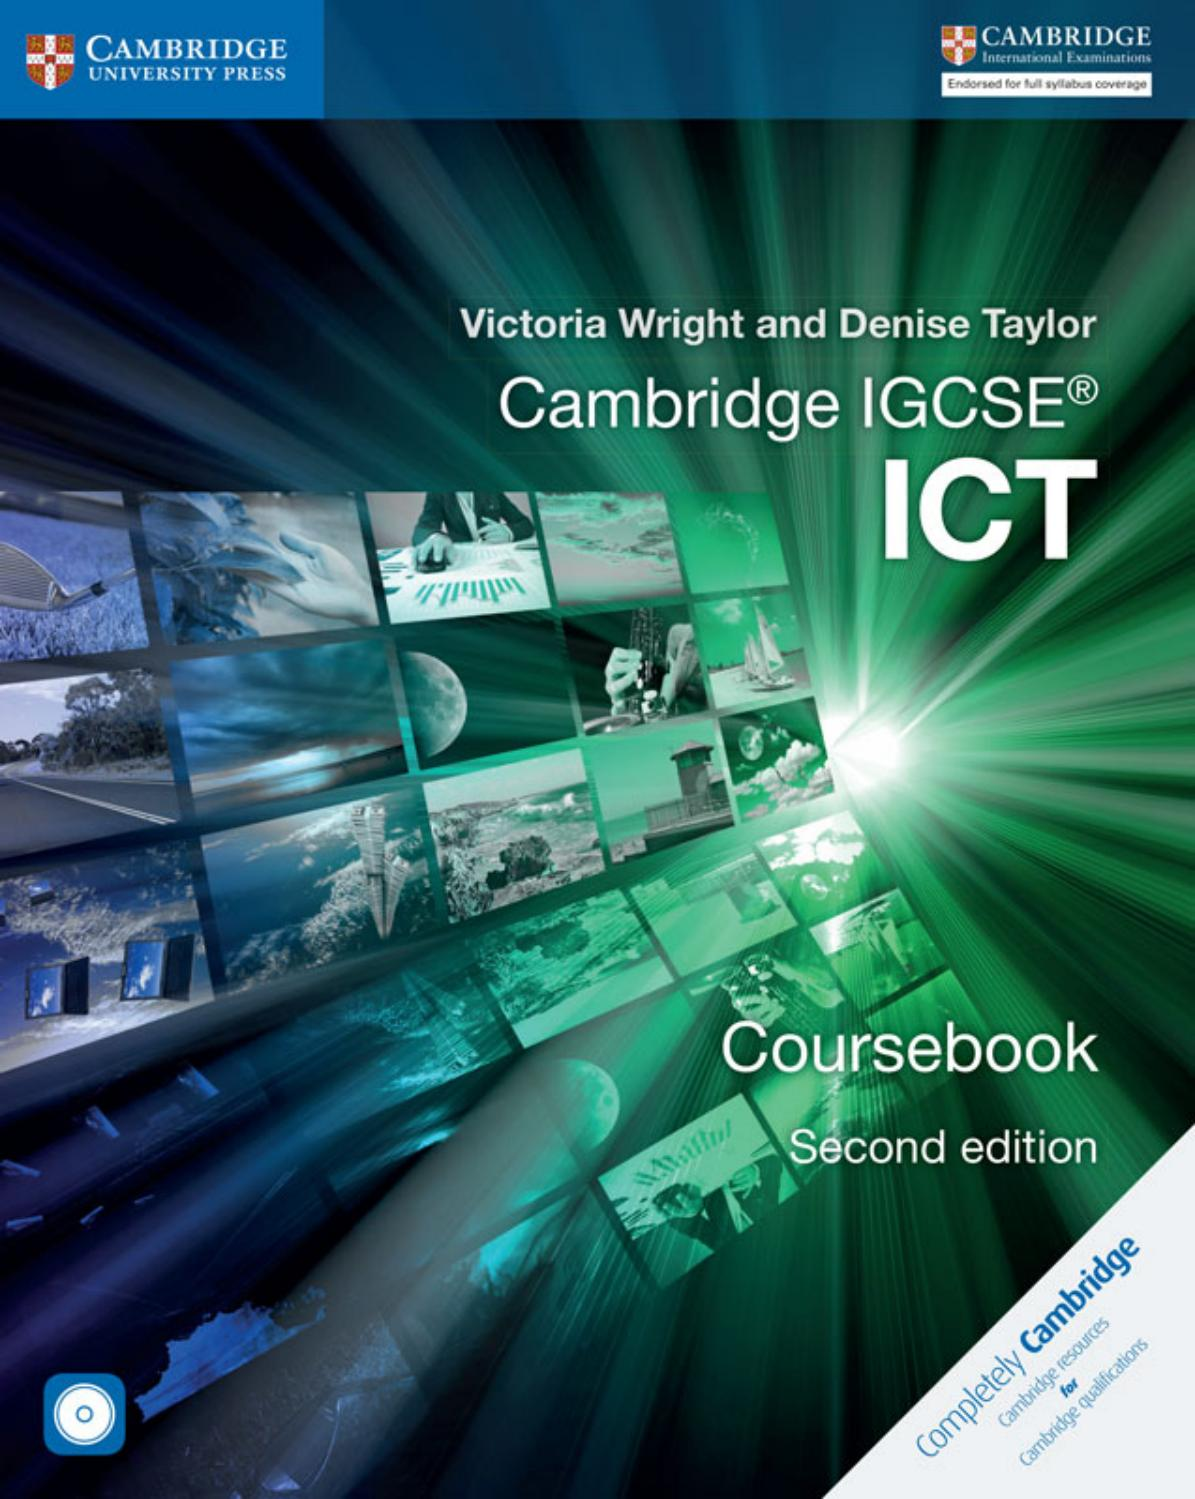 Preview Cambridge Igcse Ict Coursebook By Cambridge University Press Education Issuu